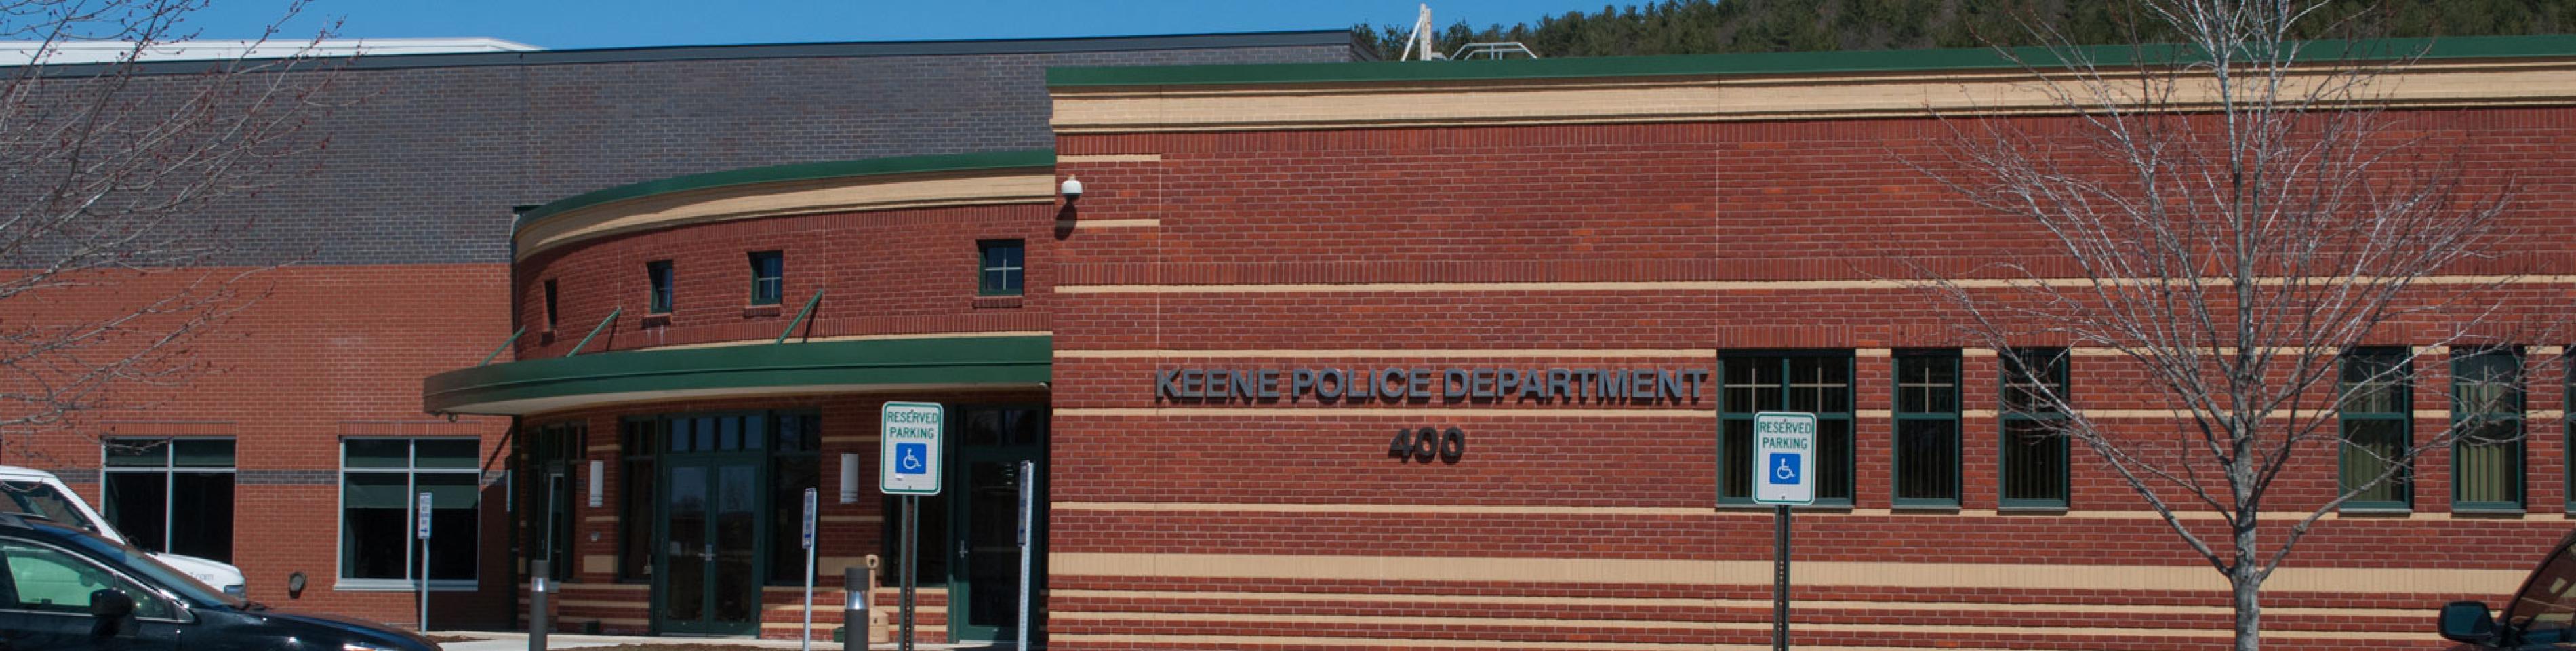 Keene Police Station